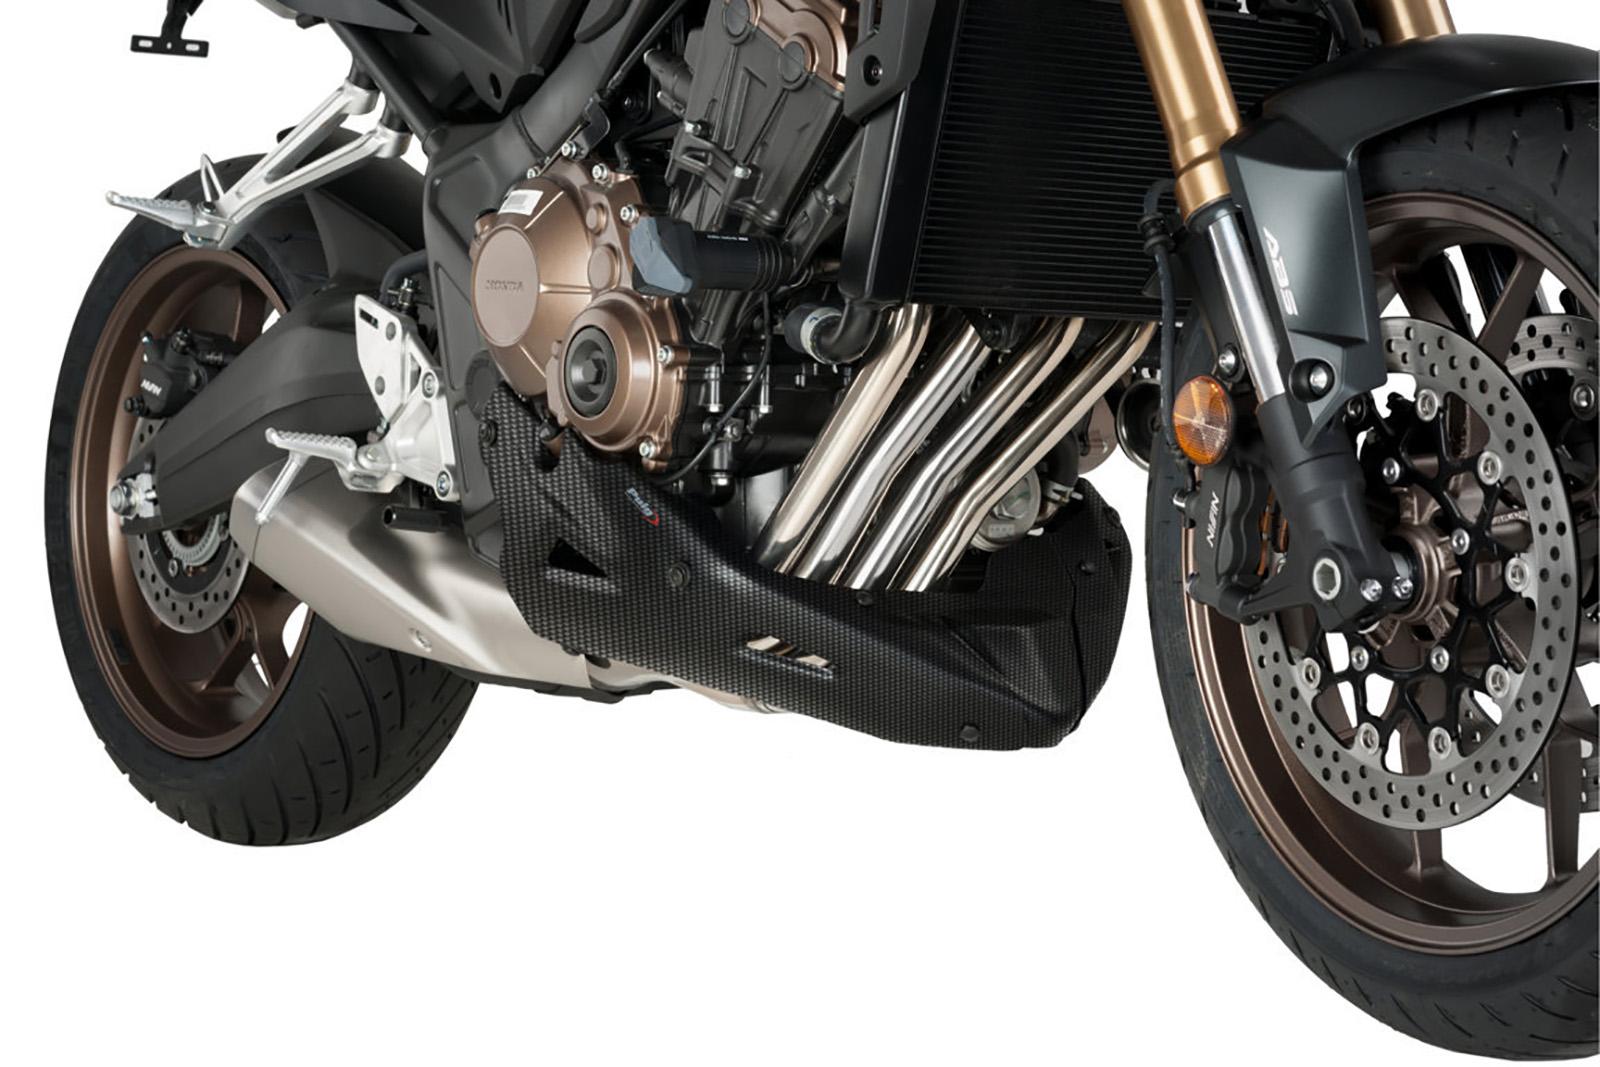 PUIG ENGINE SPOILER HONDA CB650F 2015 MATT BLACK